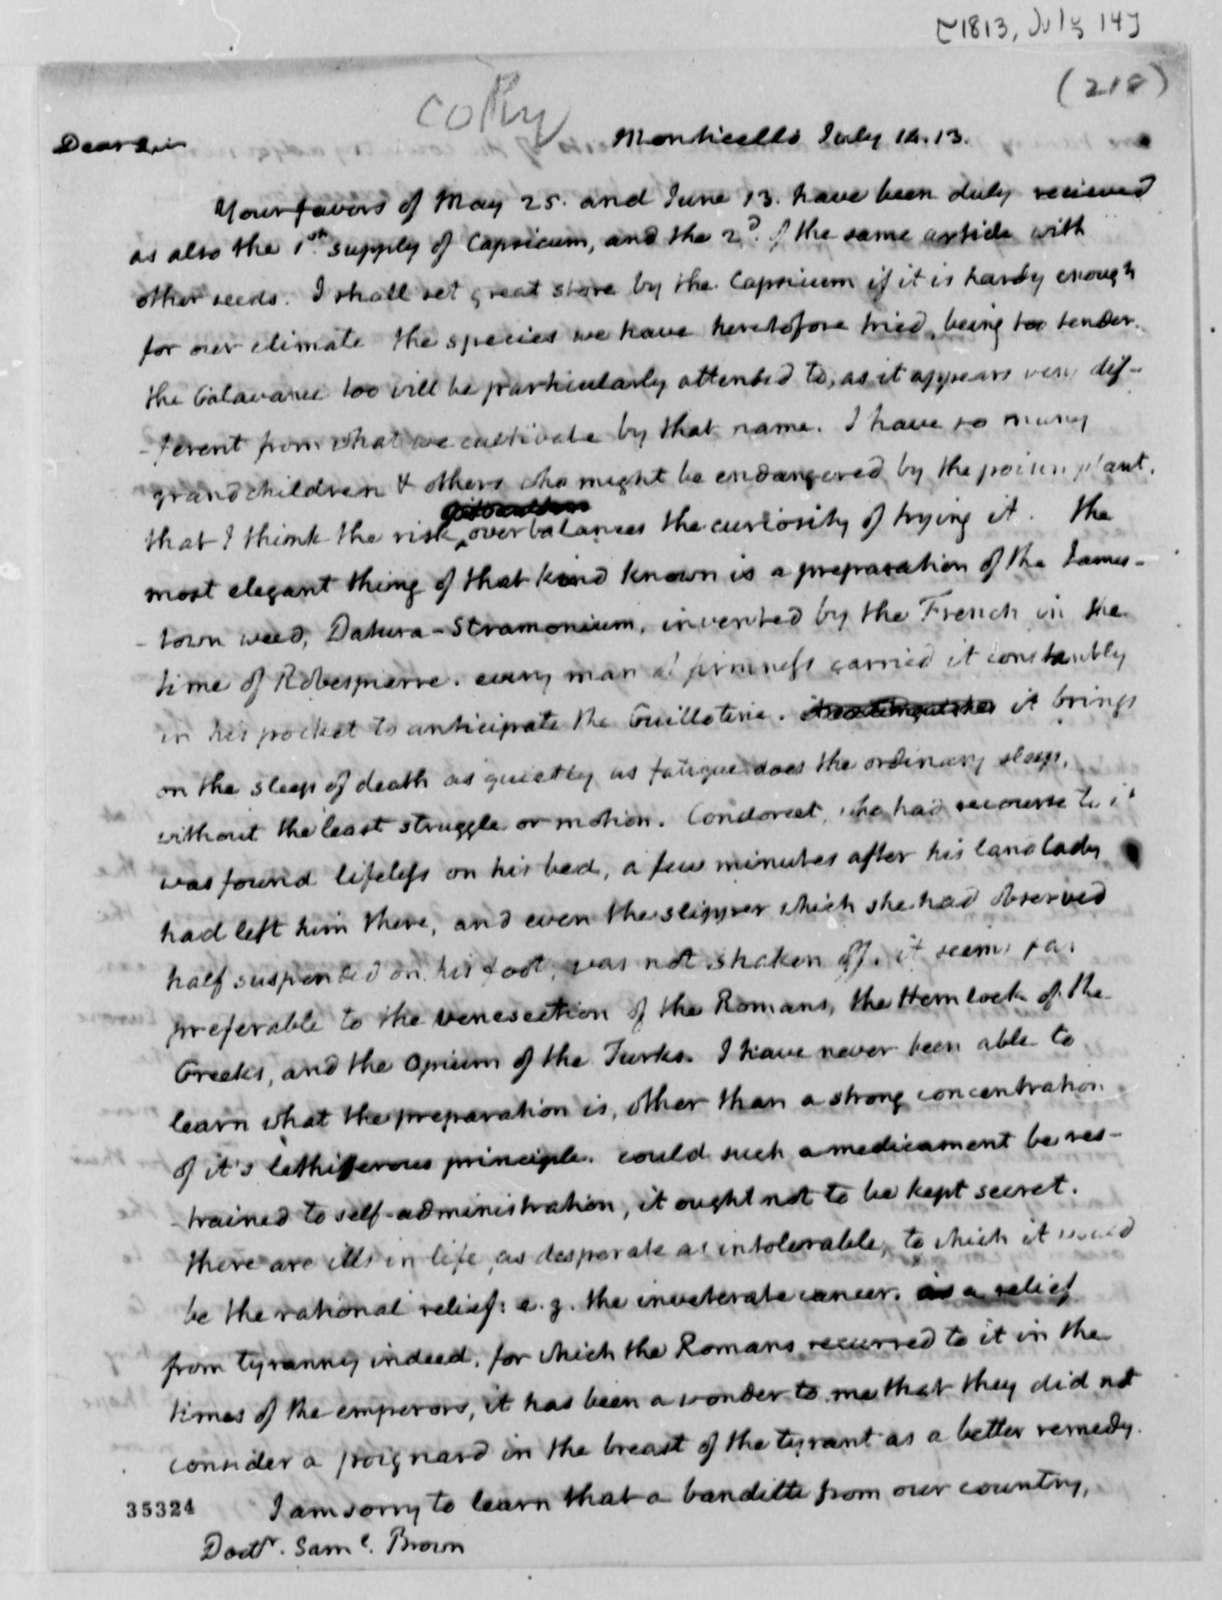 Thomas Jefferson to Samuel Brown, July 14, 1813